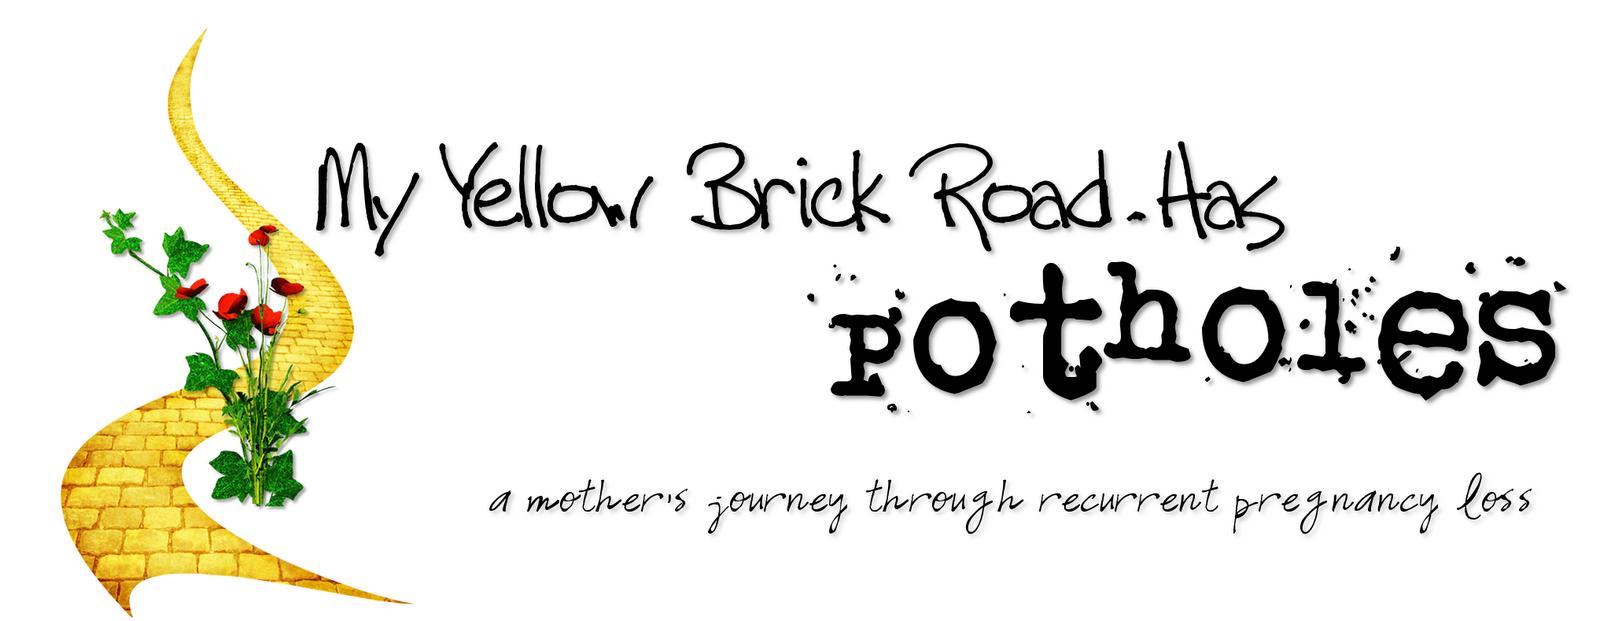 My Yellow Brick Road Has Potholes